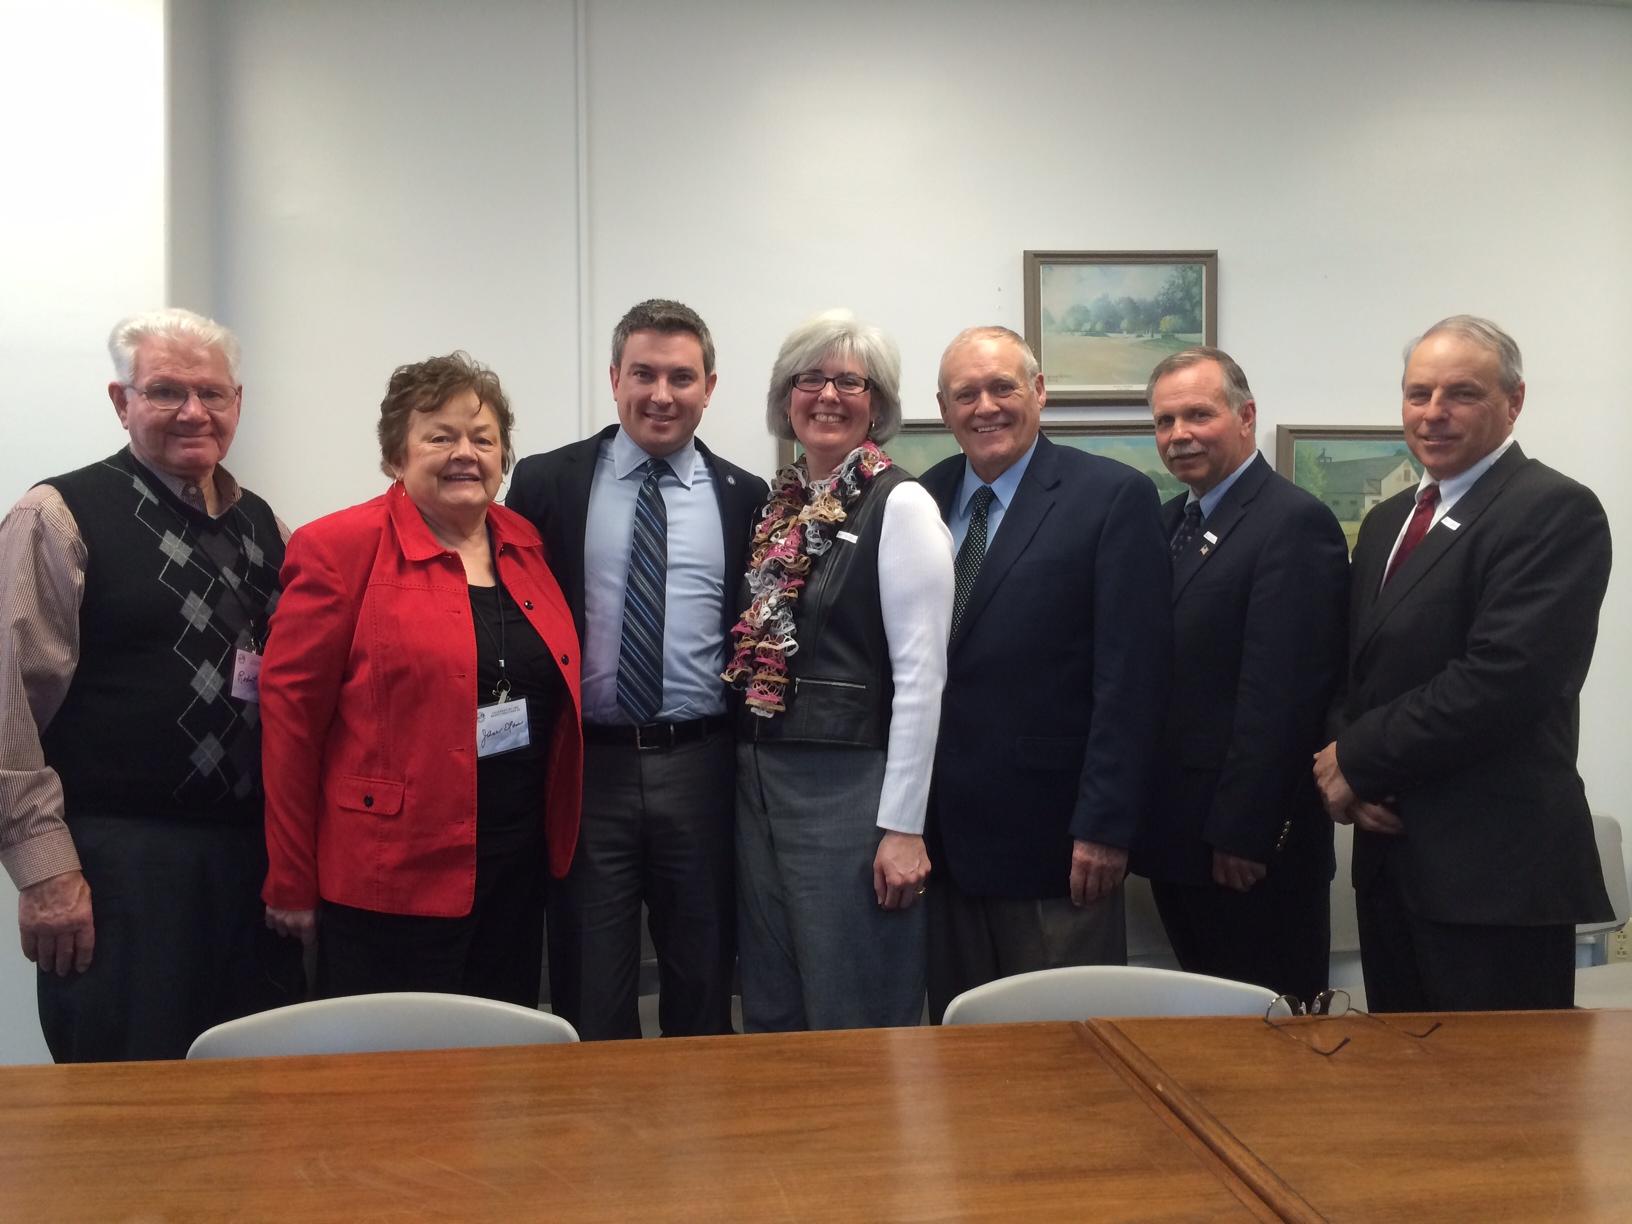 2014 Legislative meeting